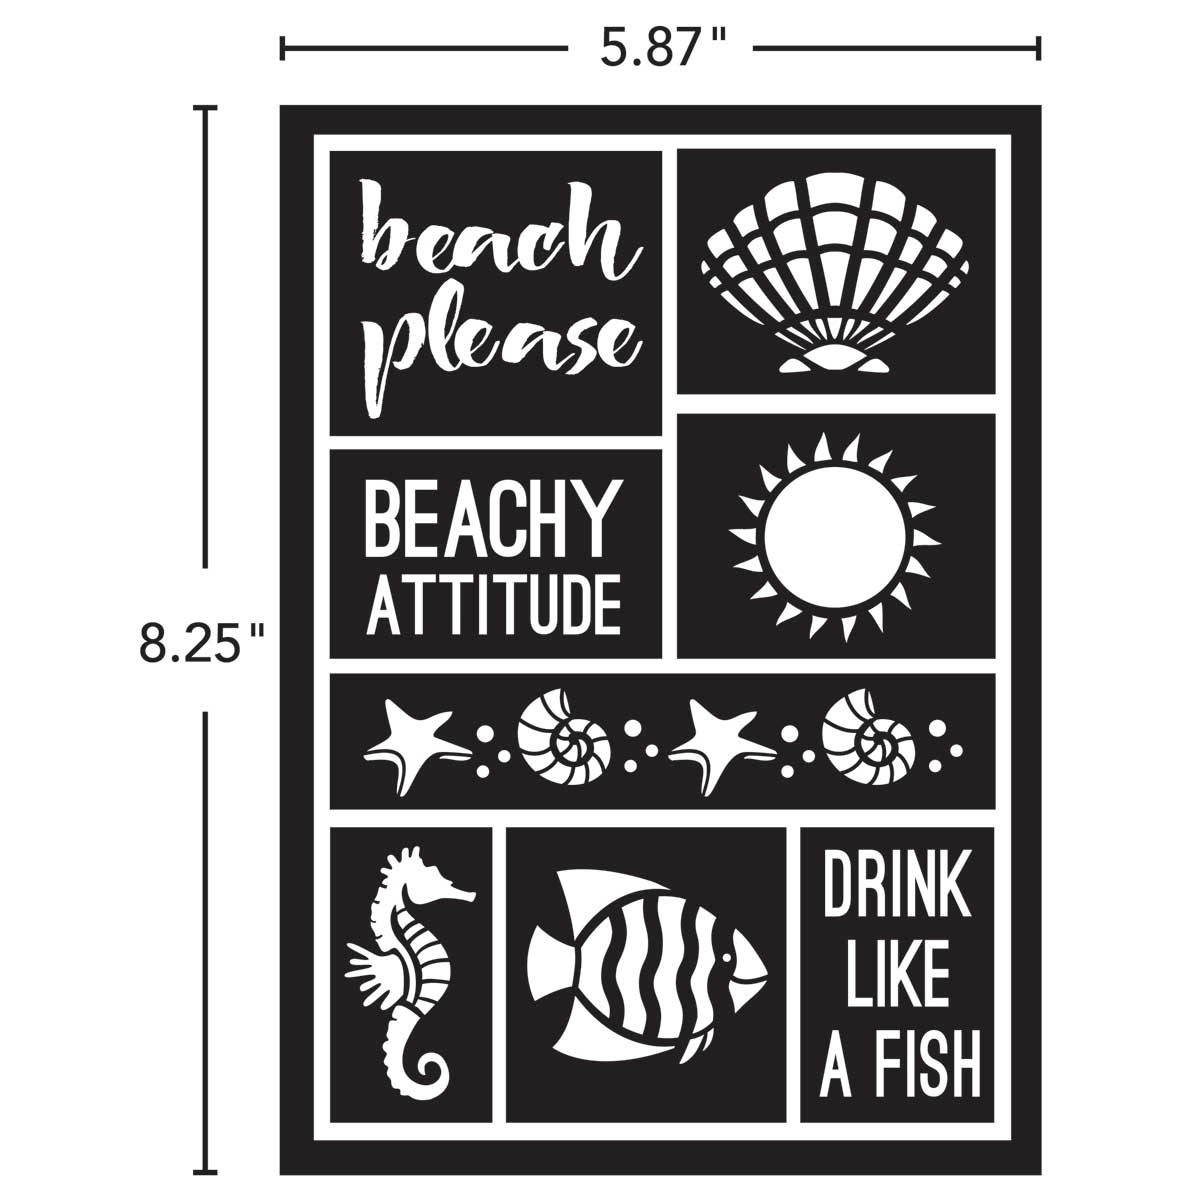 FolkArt ® Peel & Stick Painting Stencils - Beach Attitude